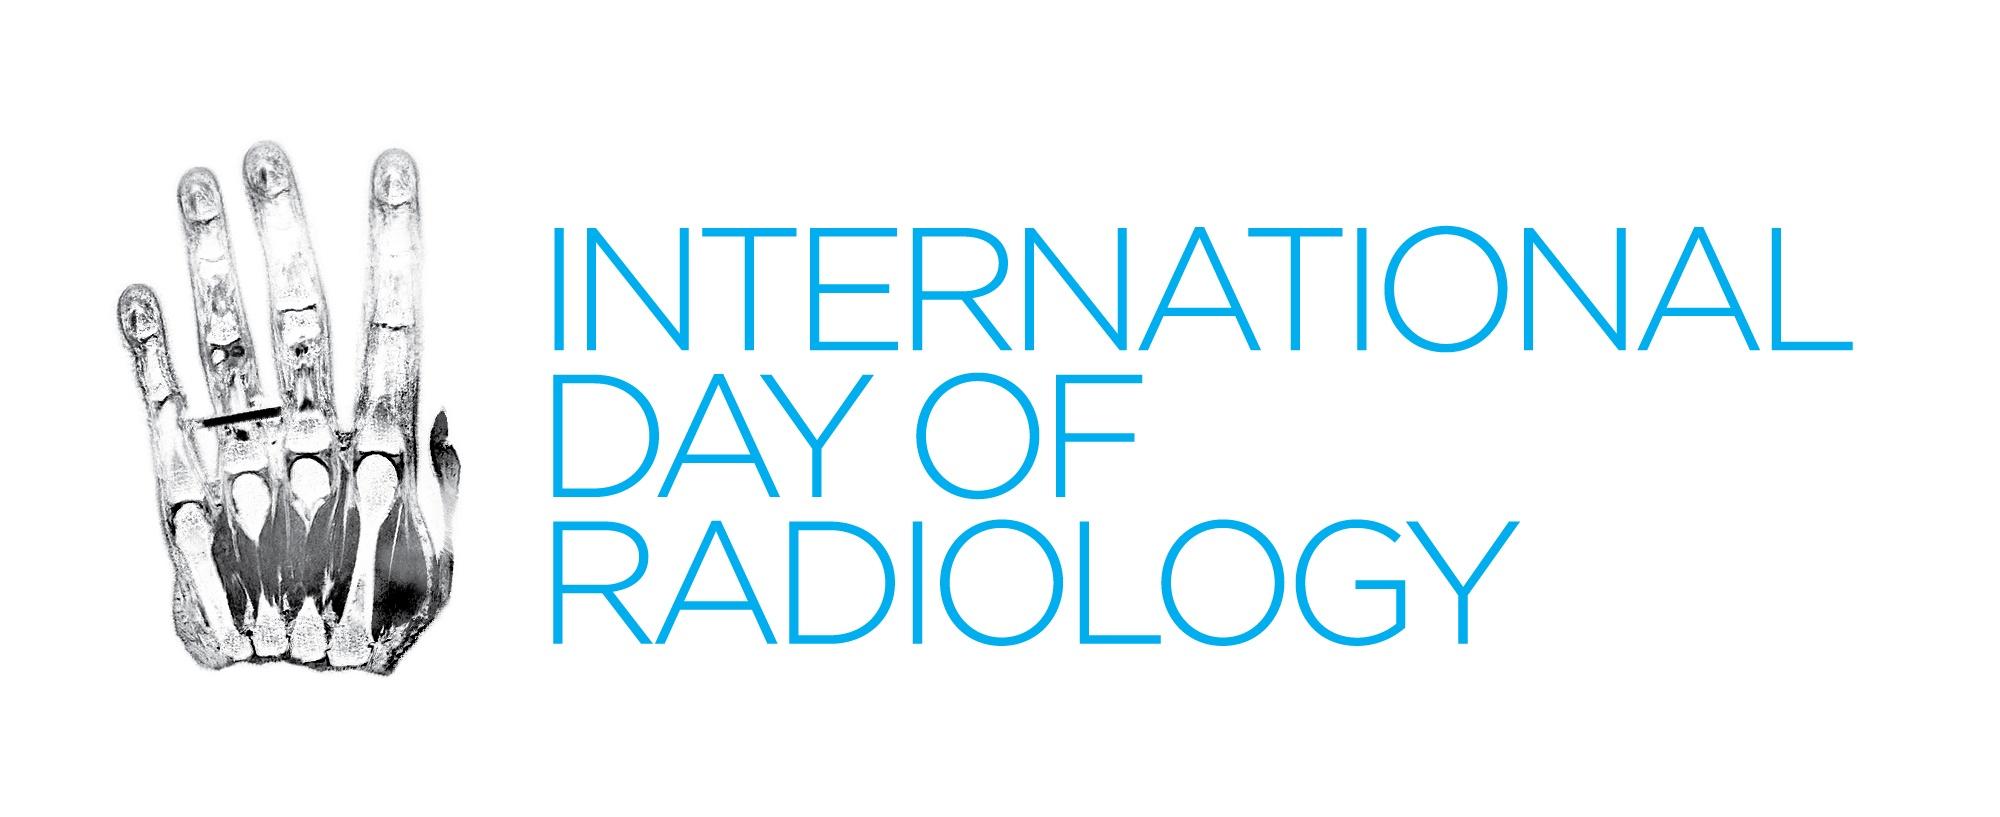 Celebrate the International Day of Radiology November 8!